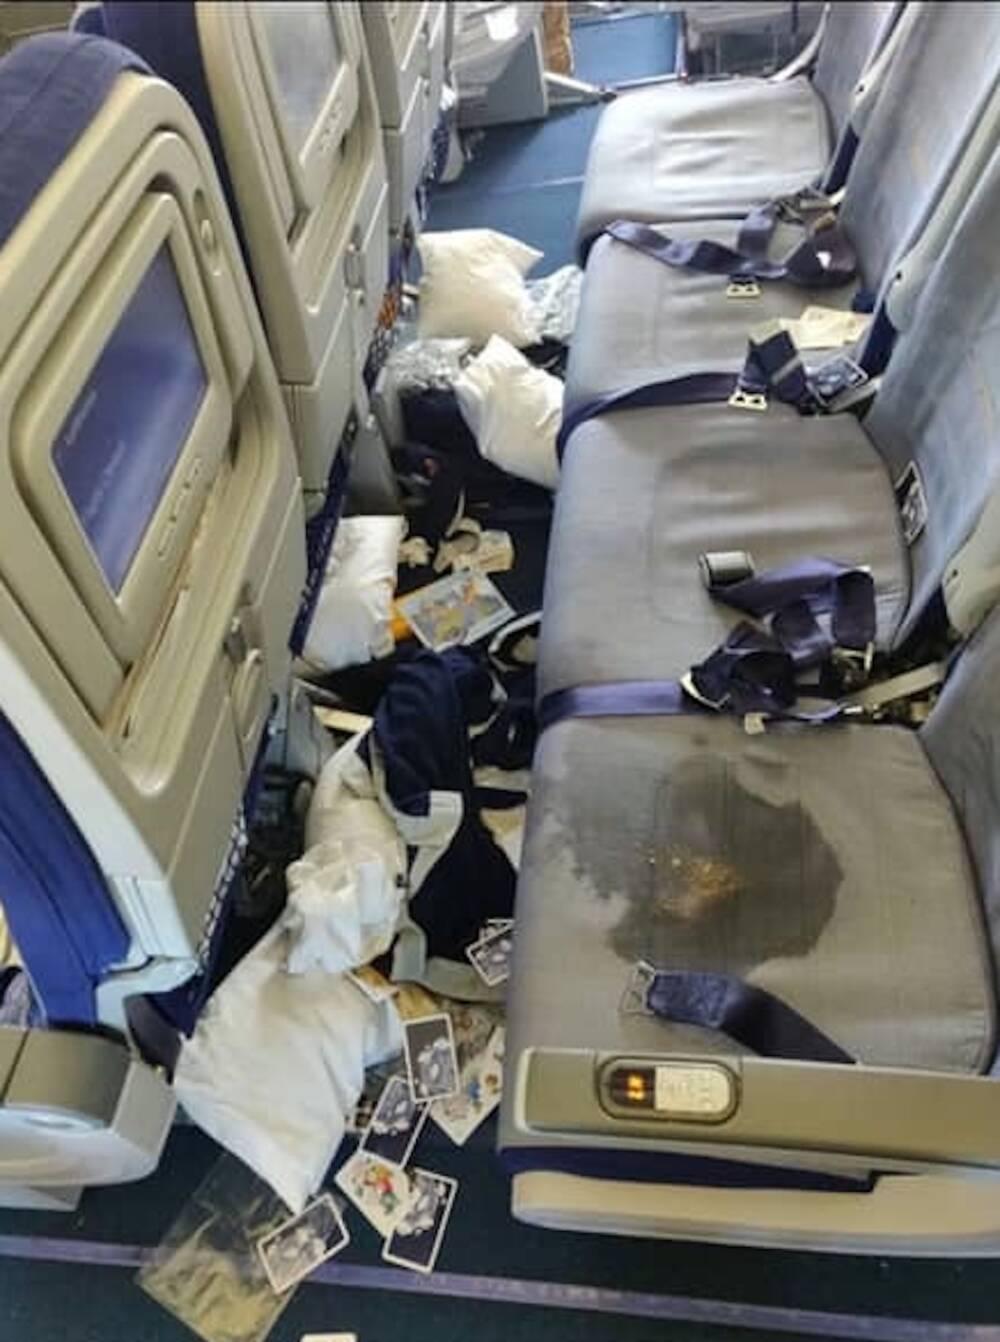 Fotos aus dem Flugzeug